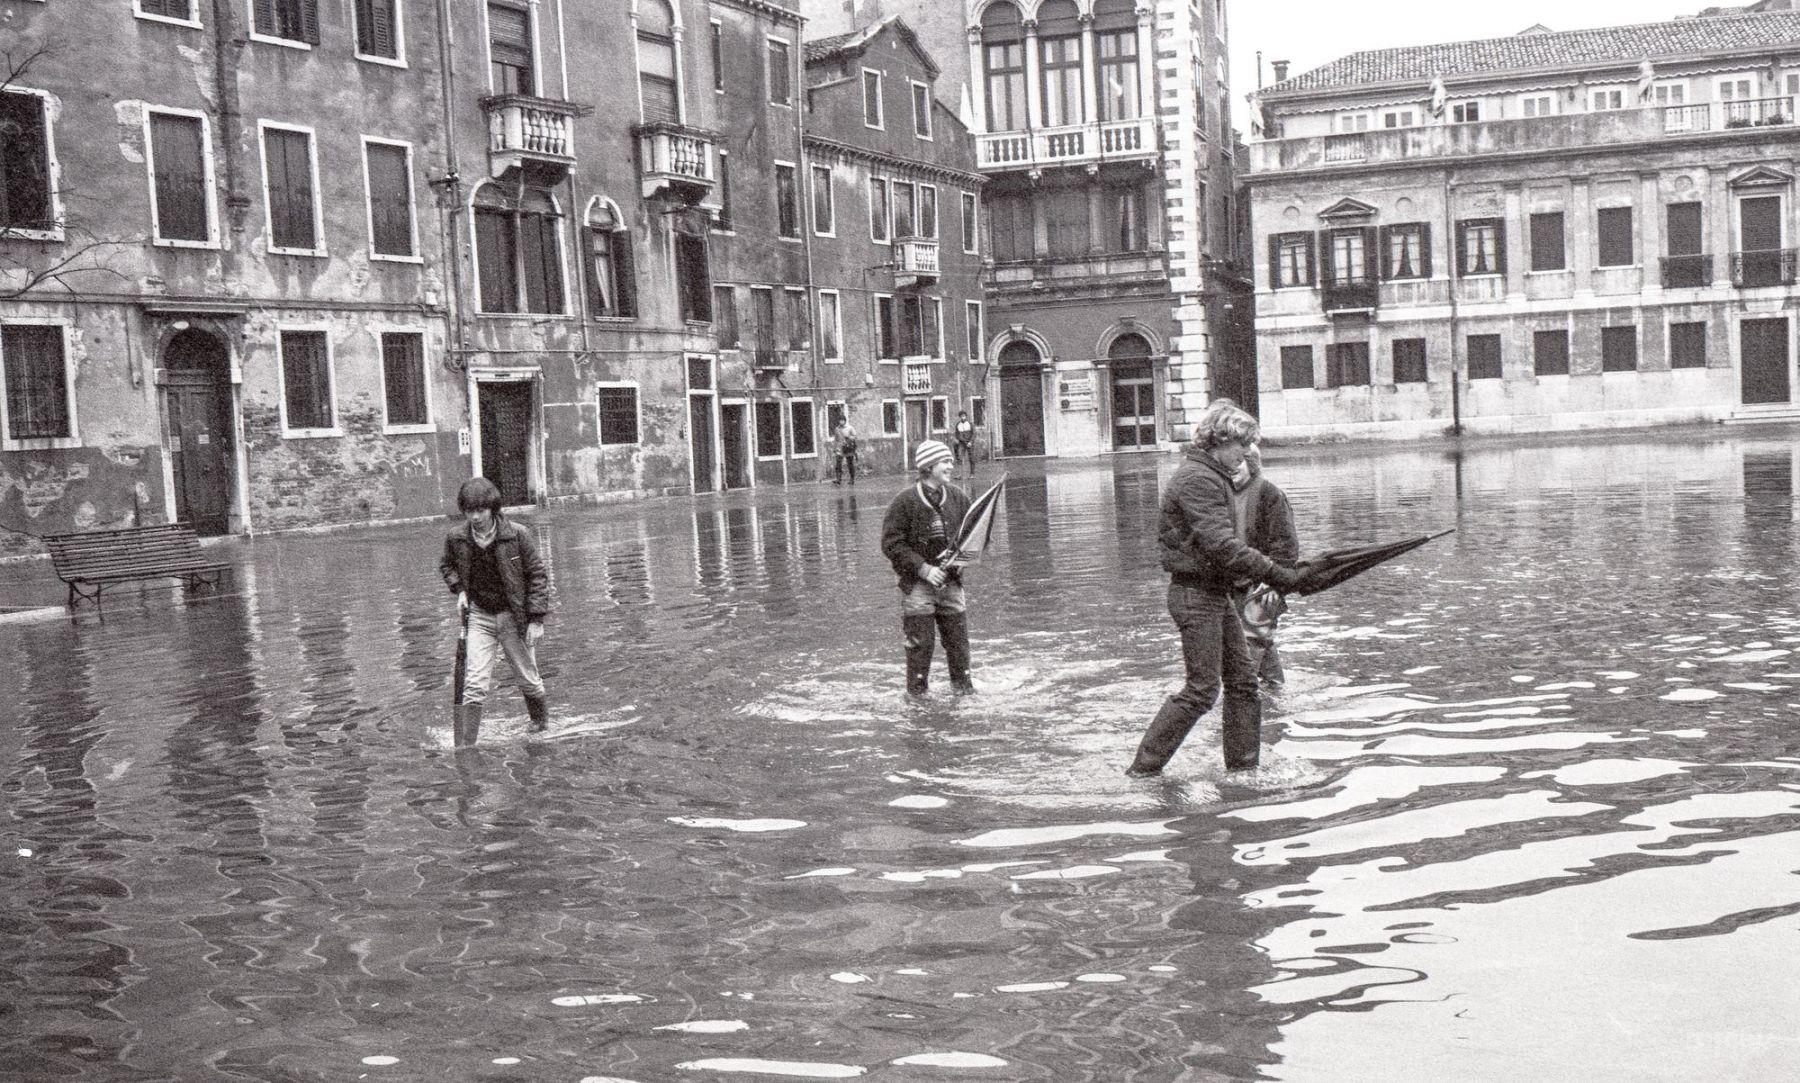 MichelAycaguer-Venise-AquaAlta-Noel-1981-18